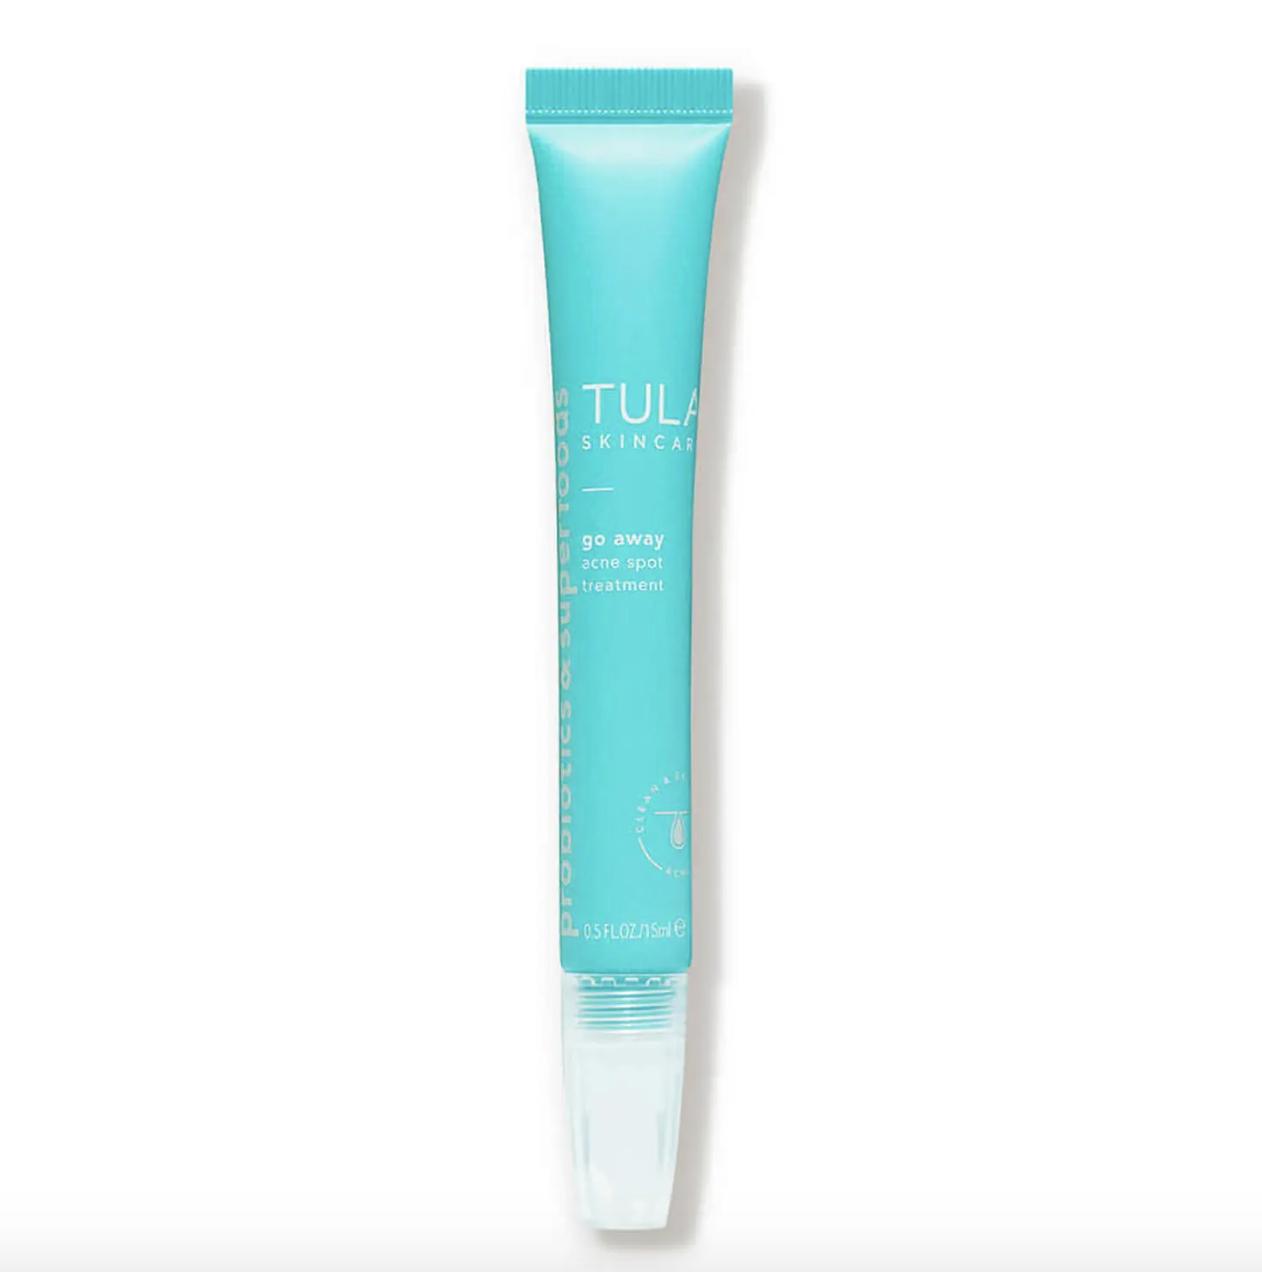 the blue tube